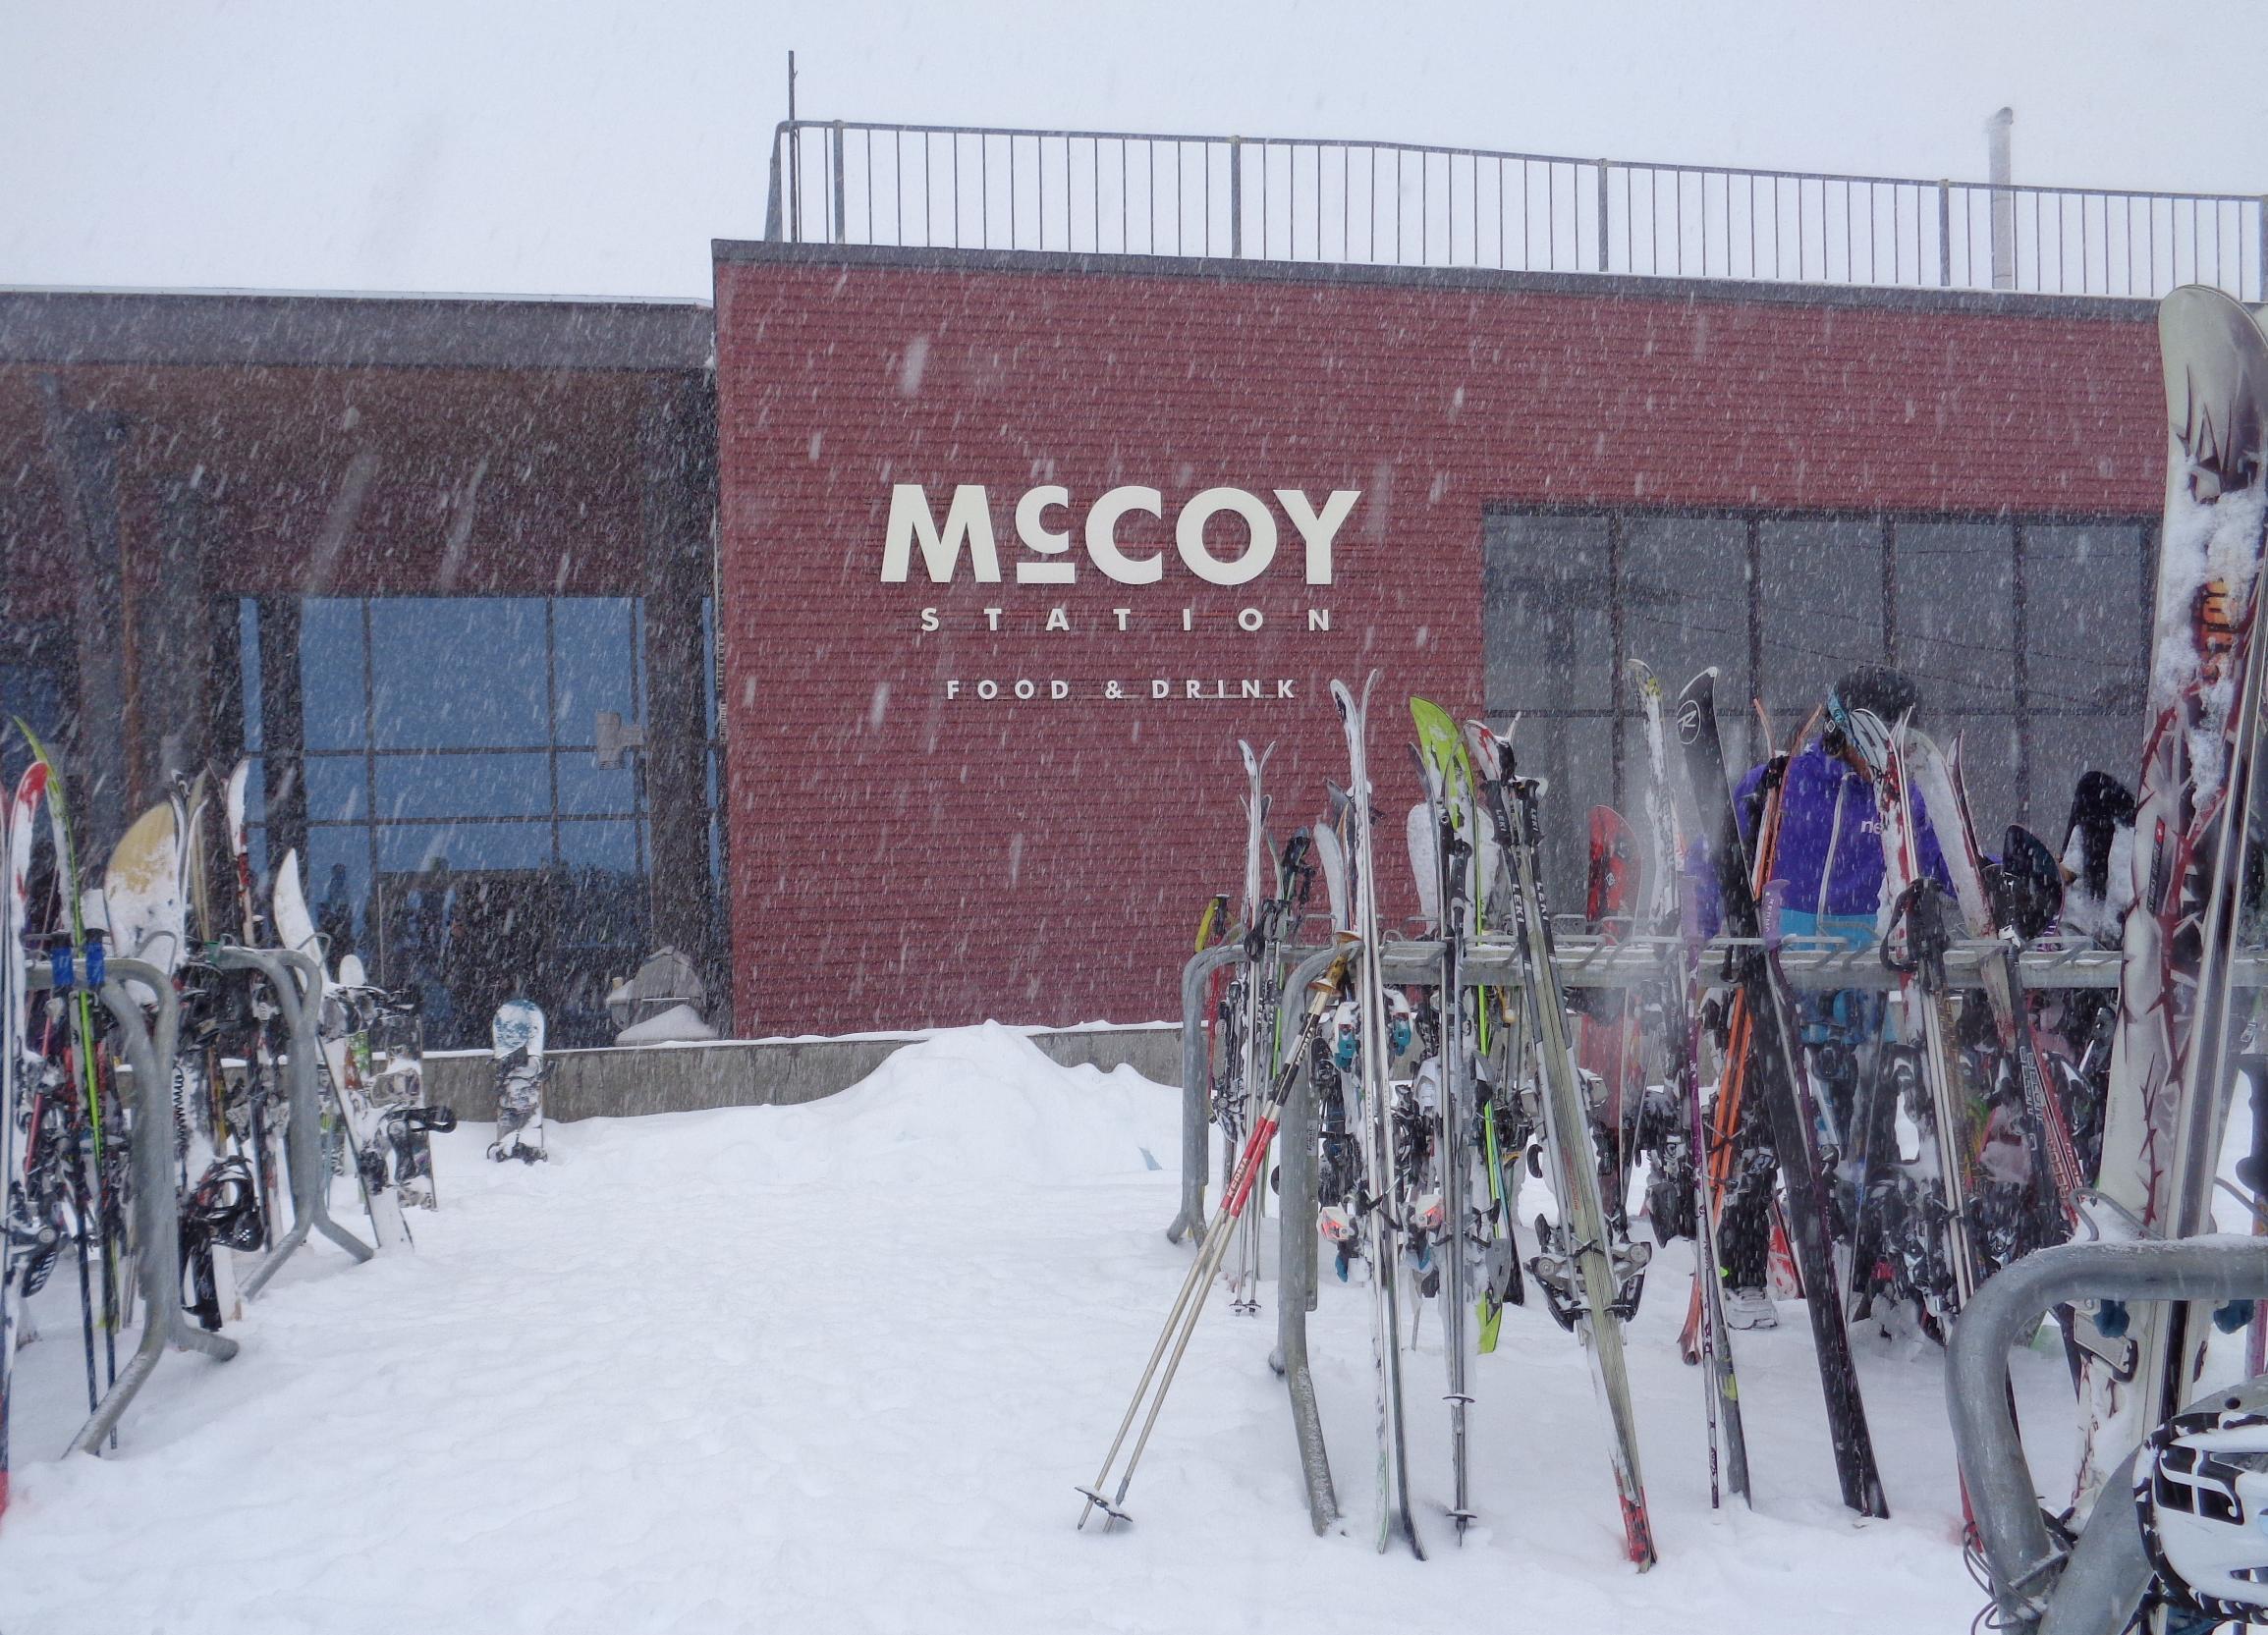 McCoy in snow